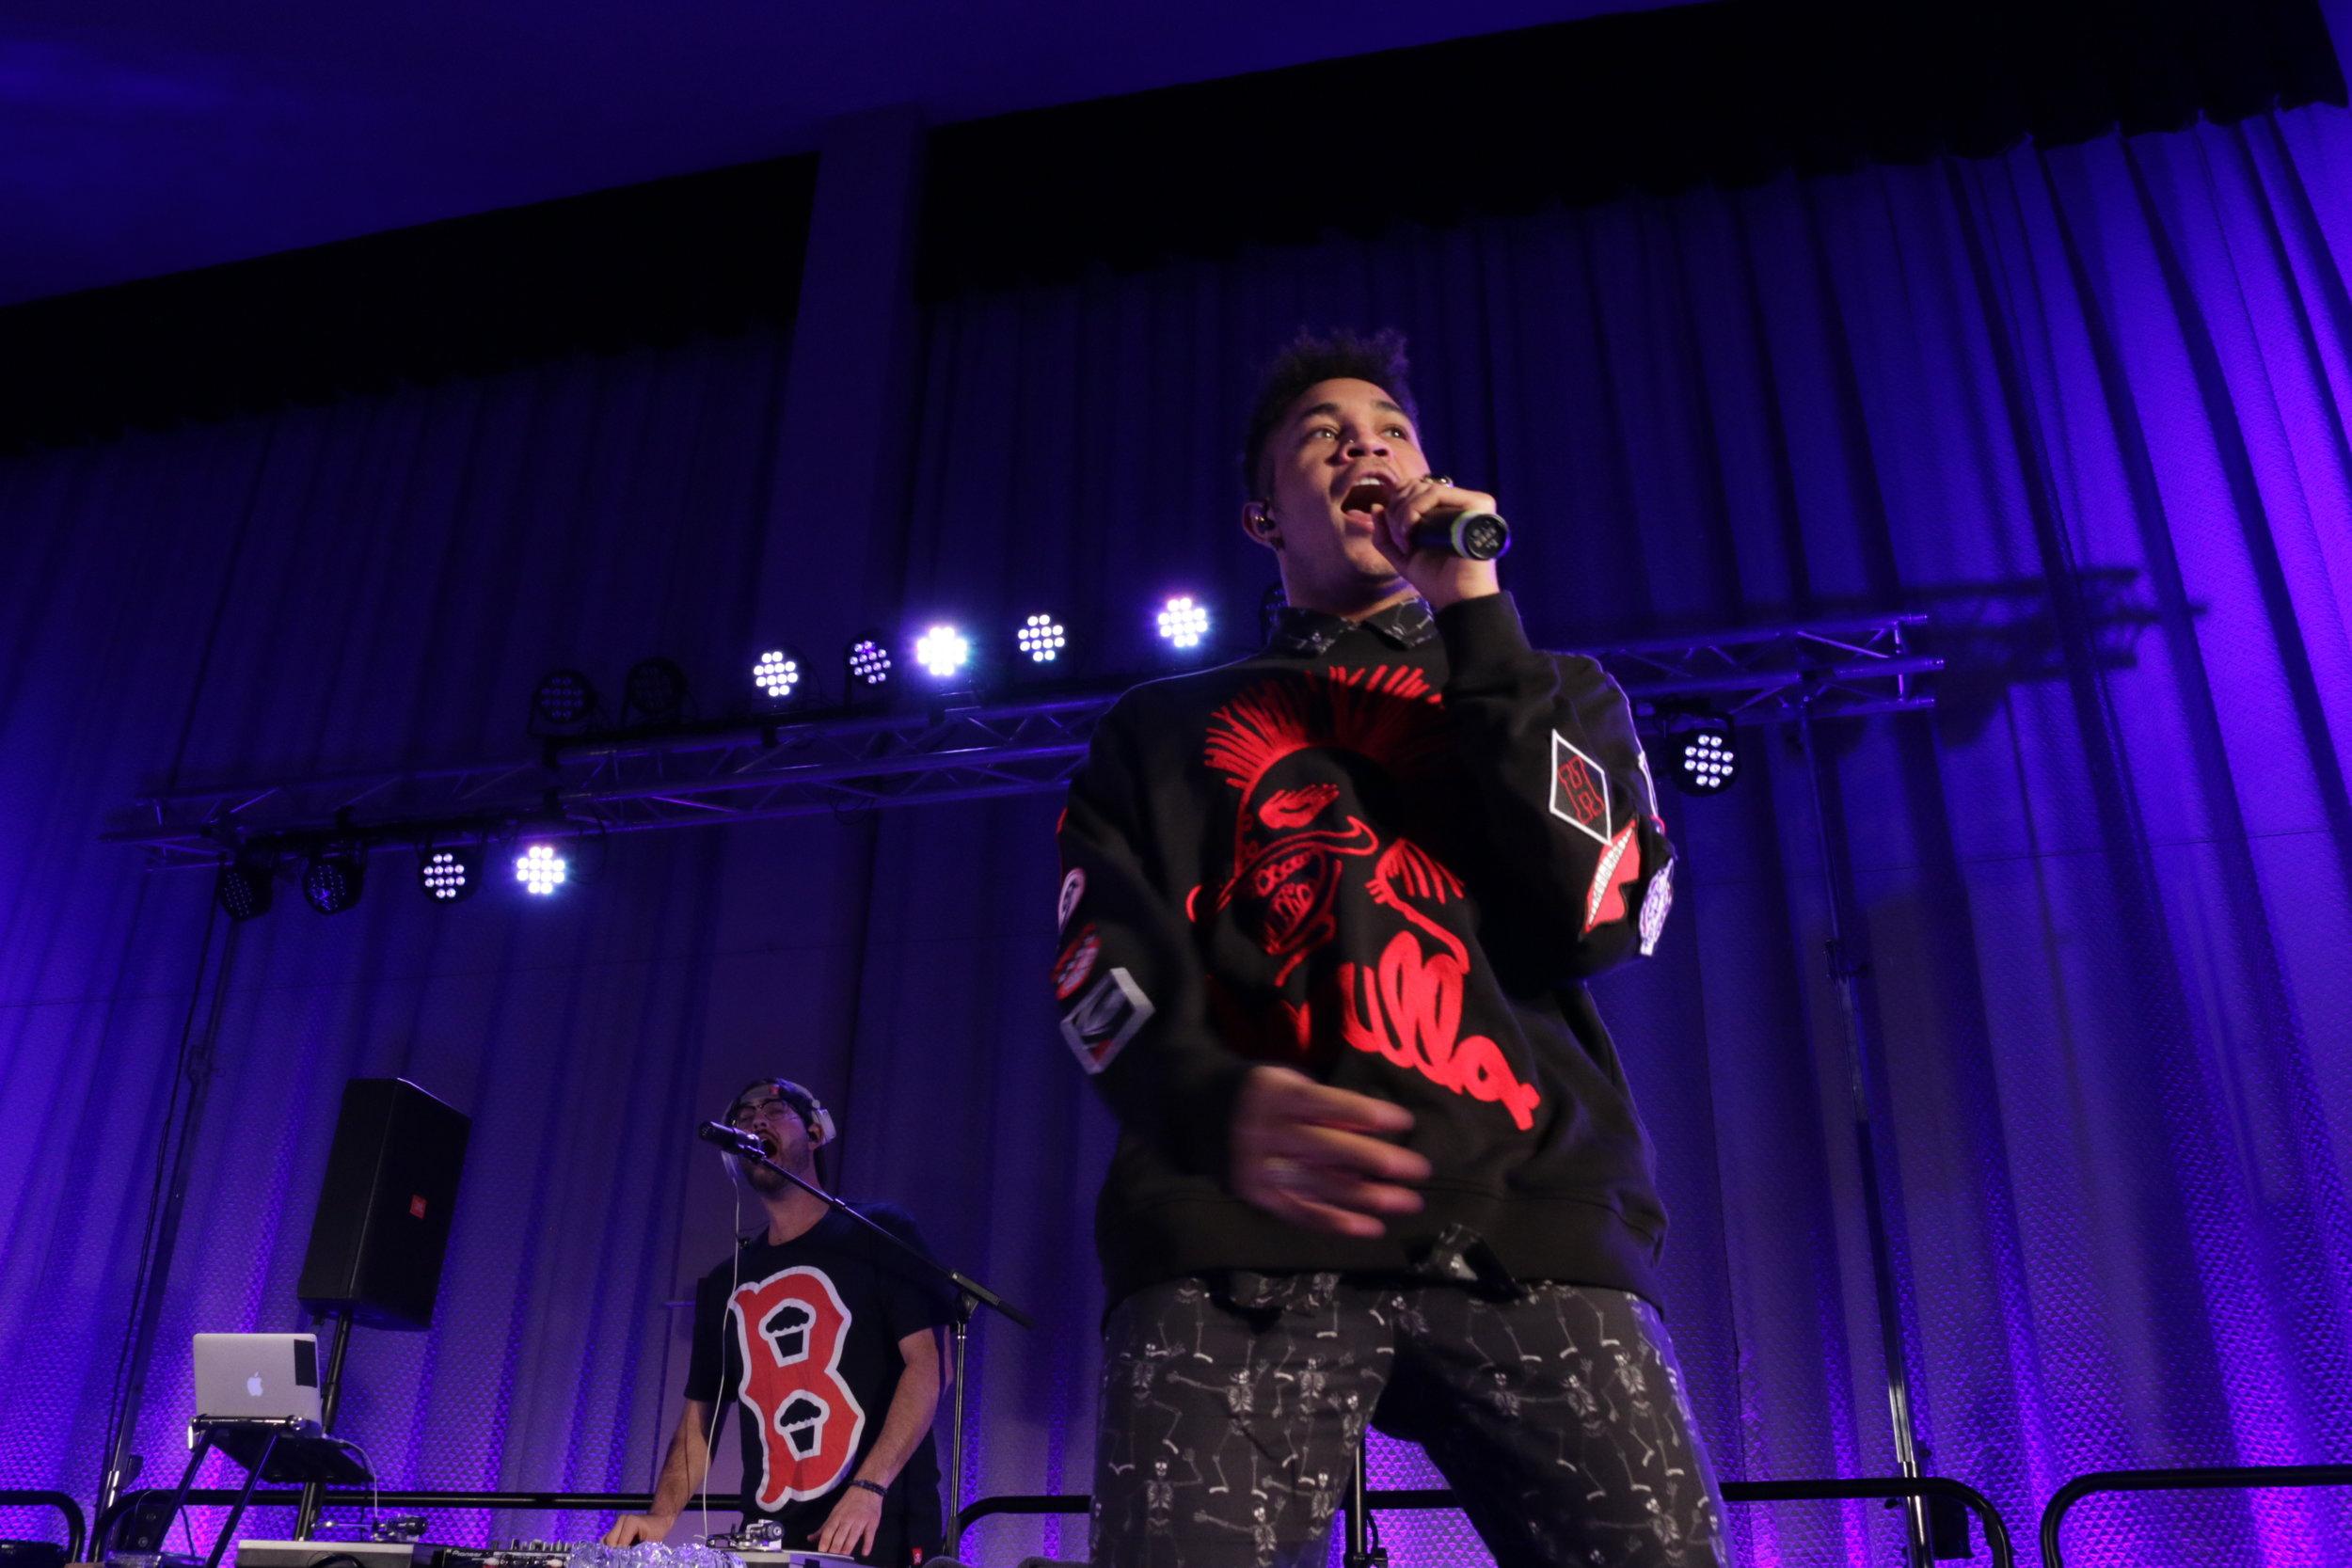 Bryce Vine - UMass Amherst - Fall 2018 - On December 5, 2018, rapper and singer, Bryce Vine, performed at UMass Amherst.